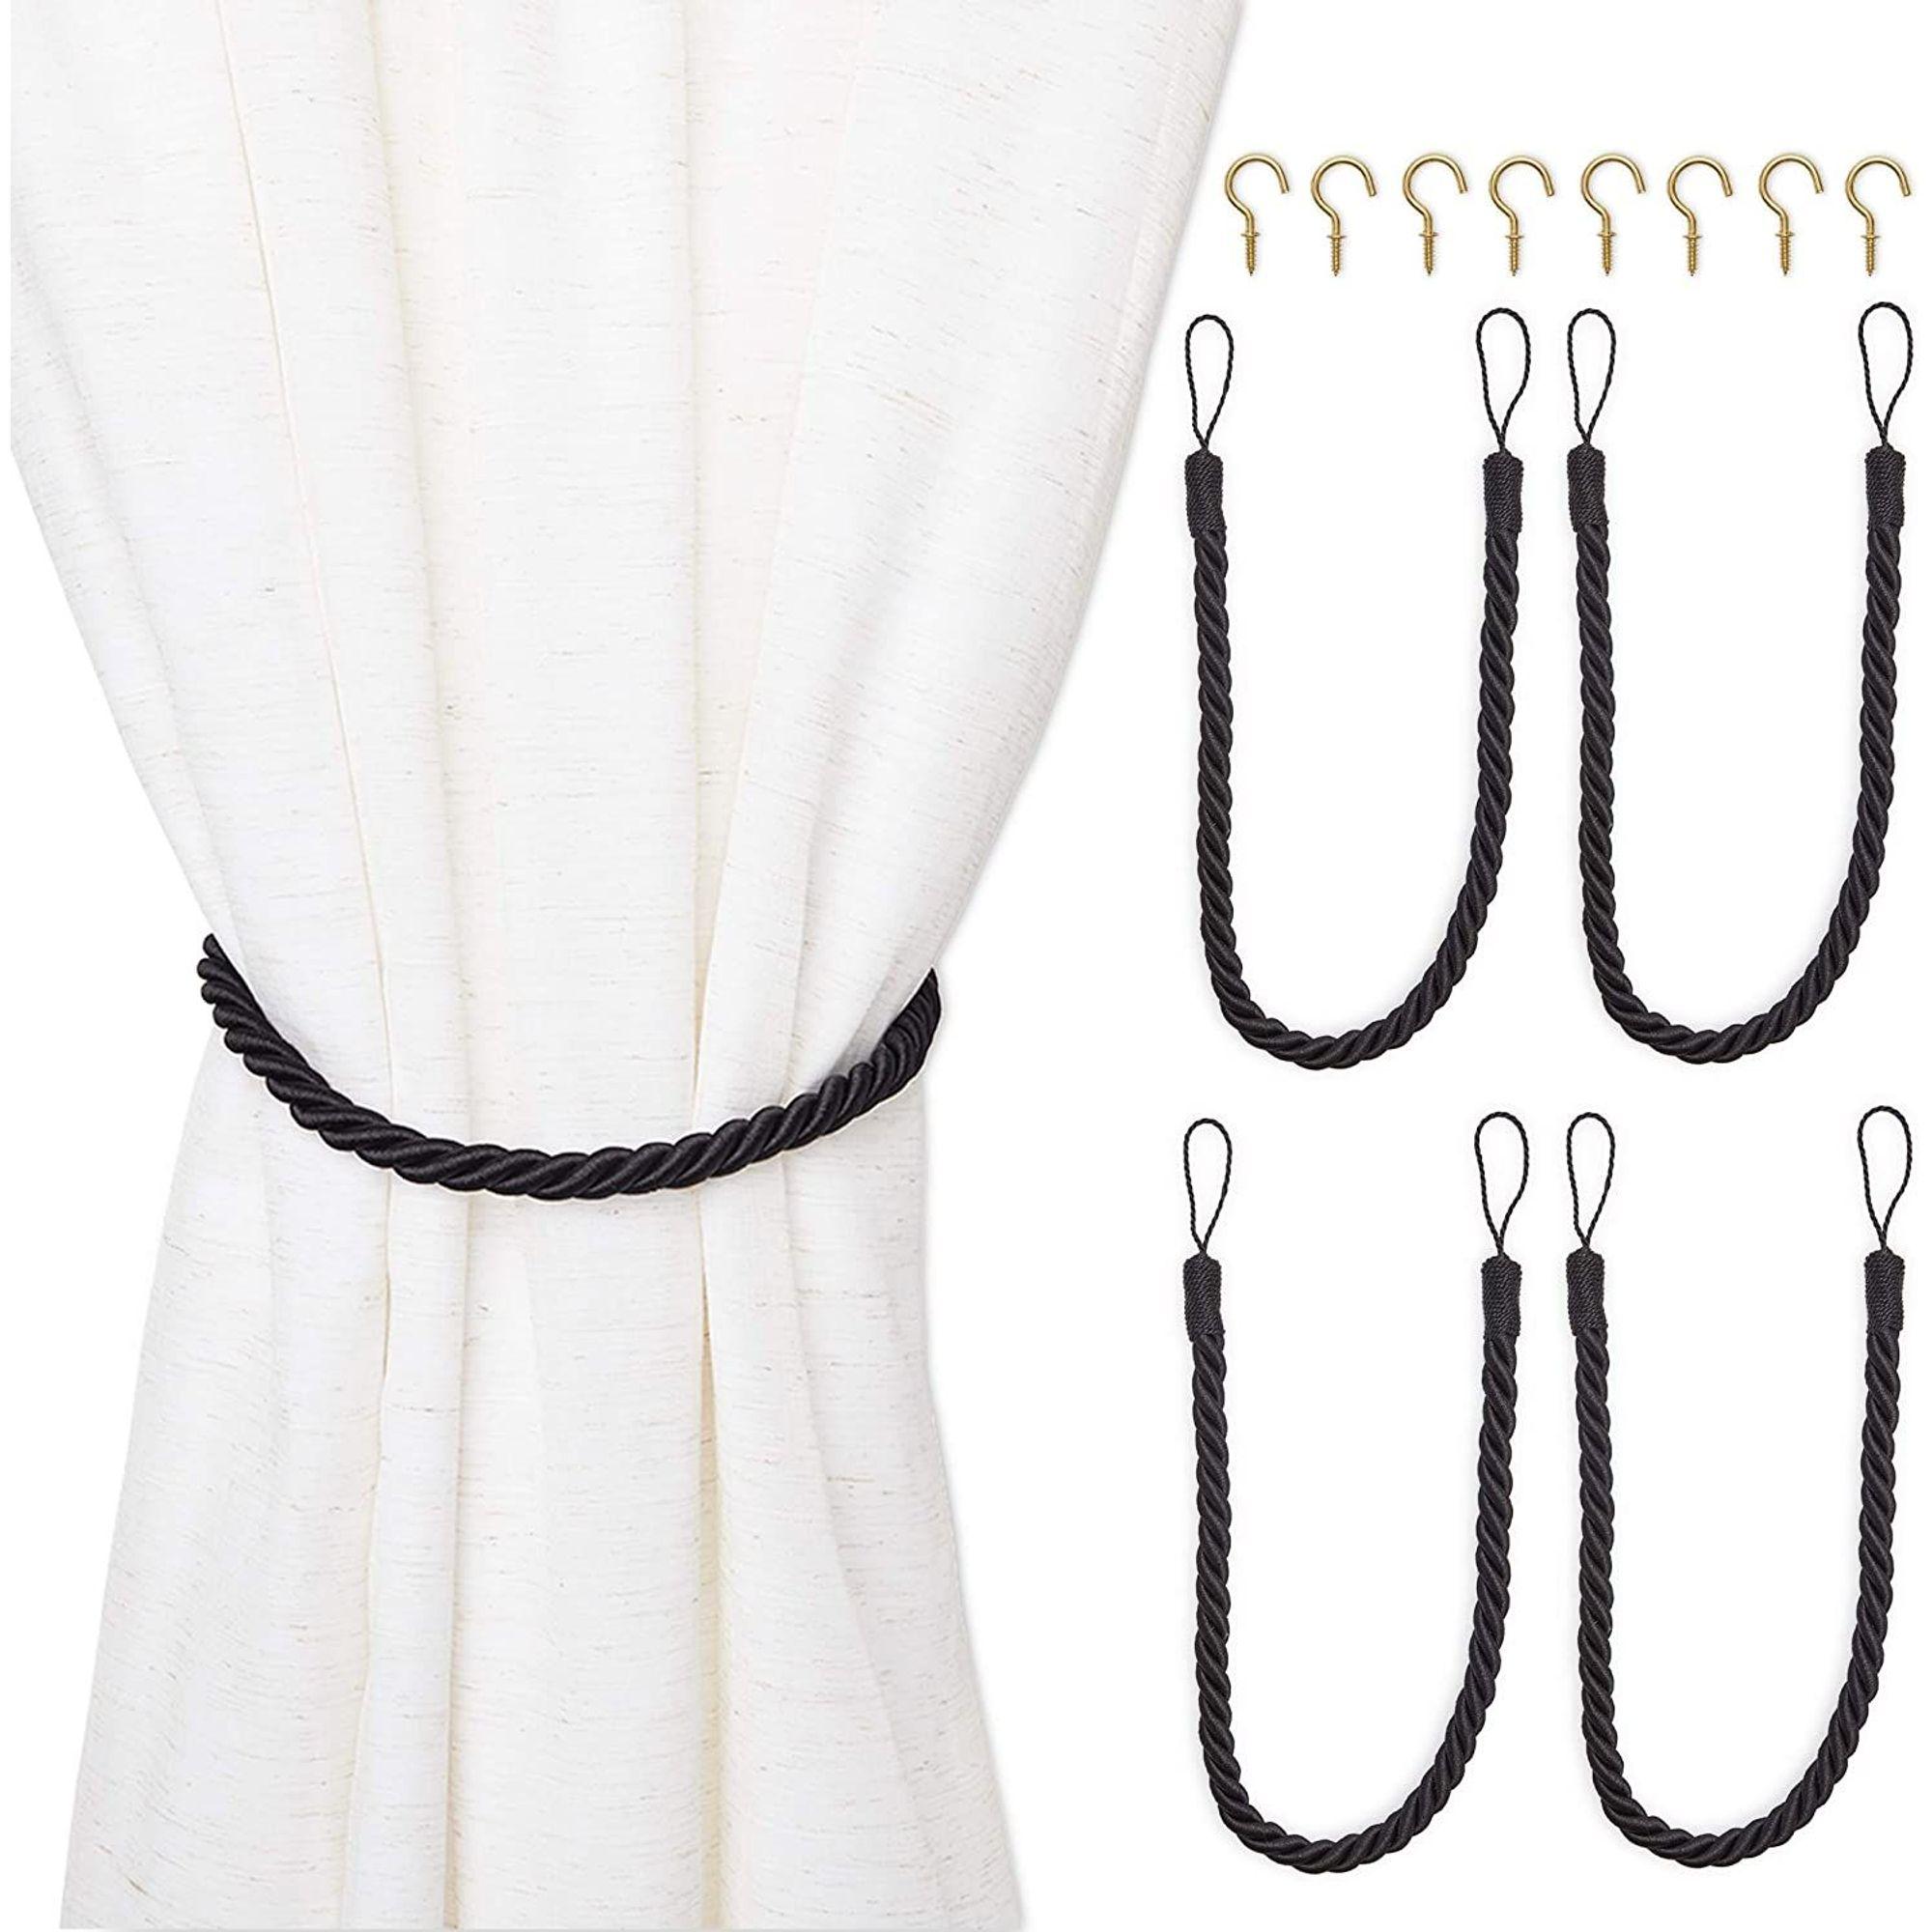 4 pack black cotton window curtain tiebacks tie back with 8 hooks 26 holdbacks rope for drapes